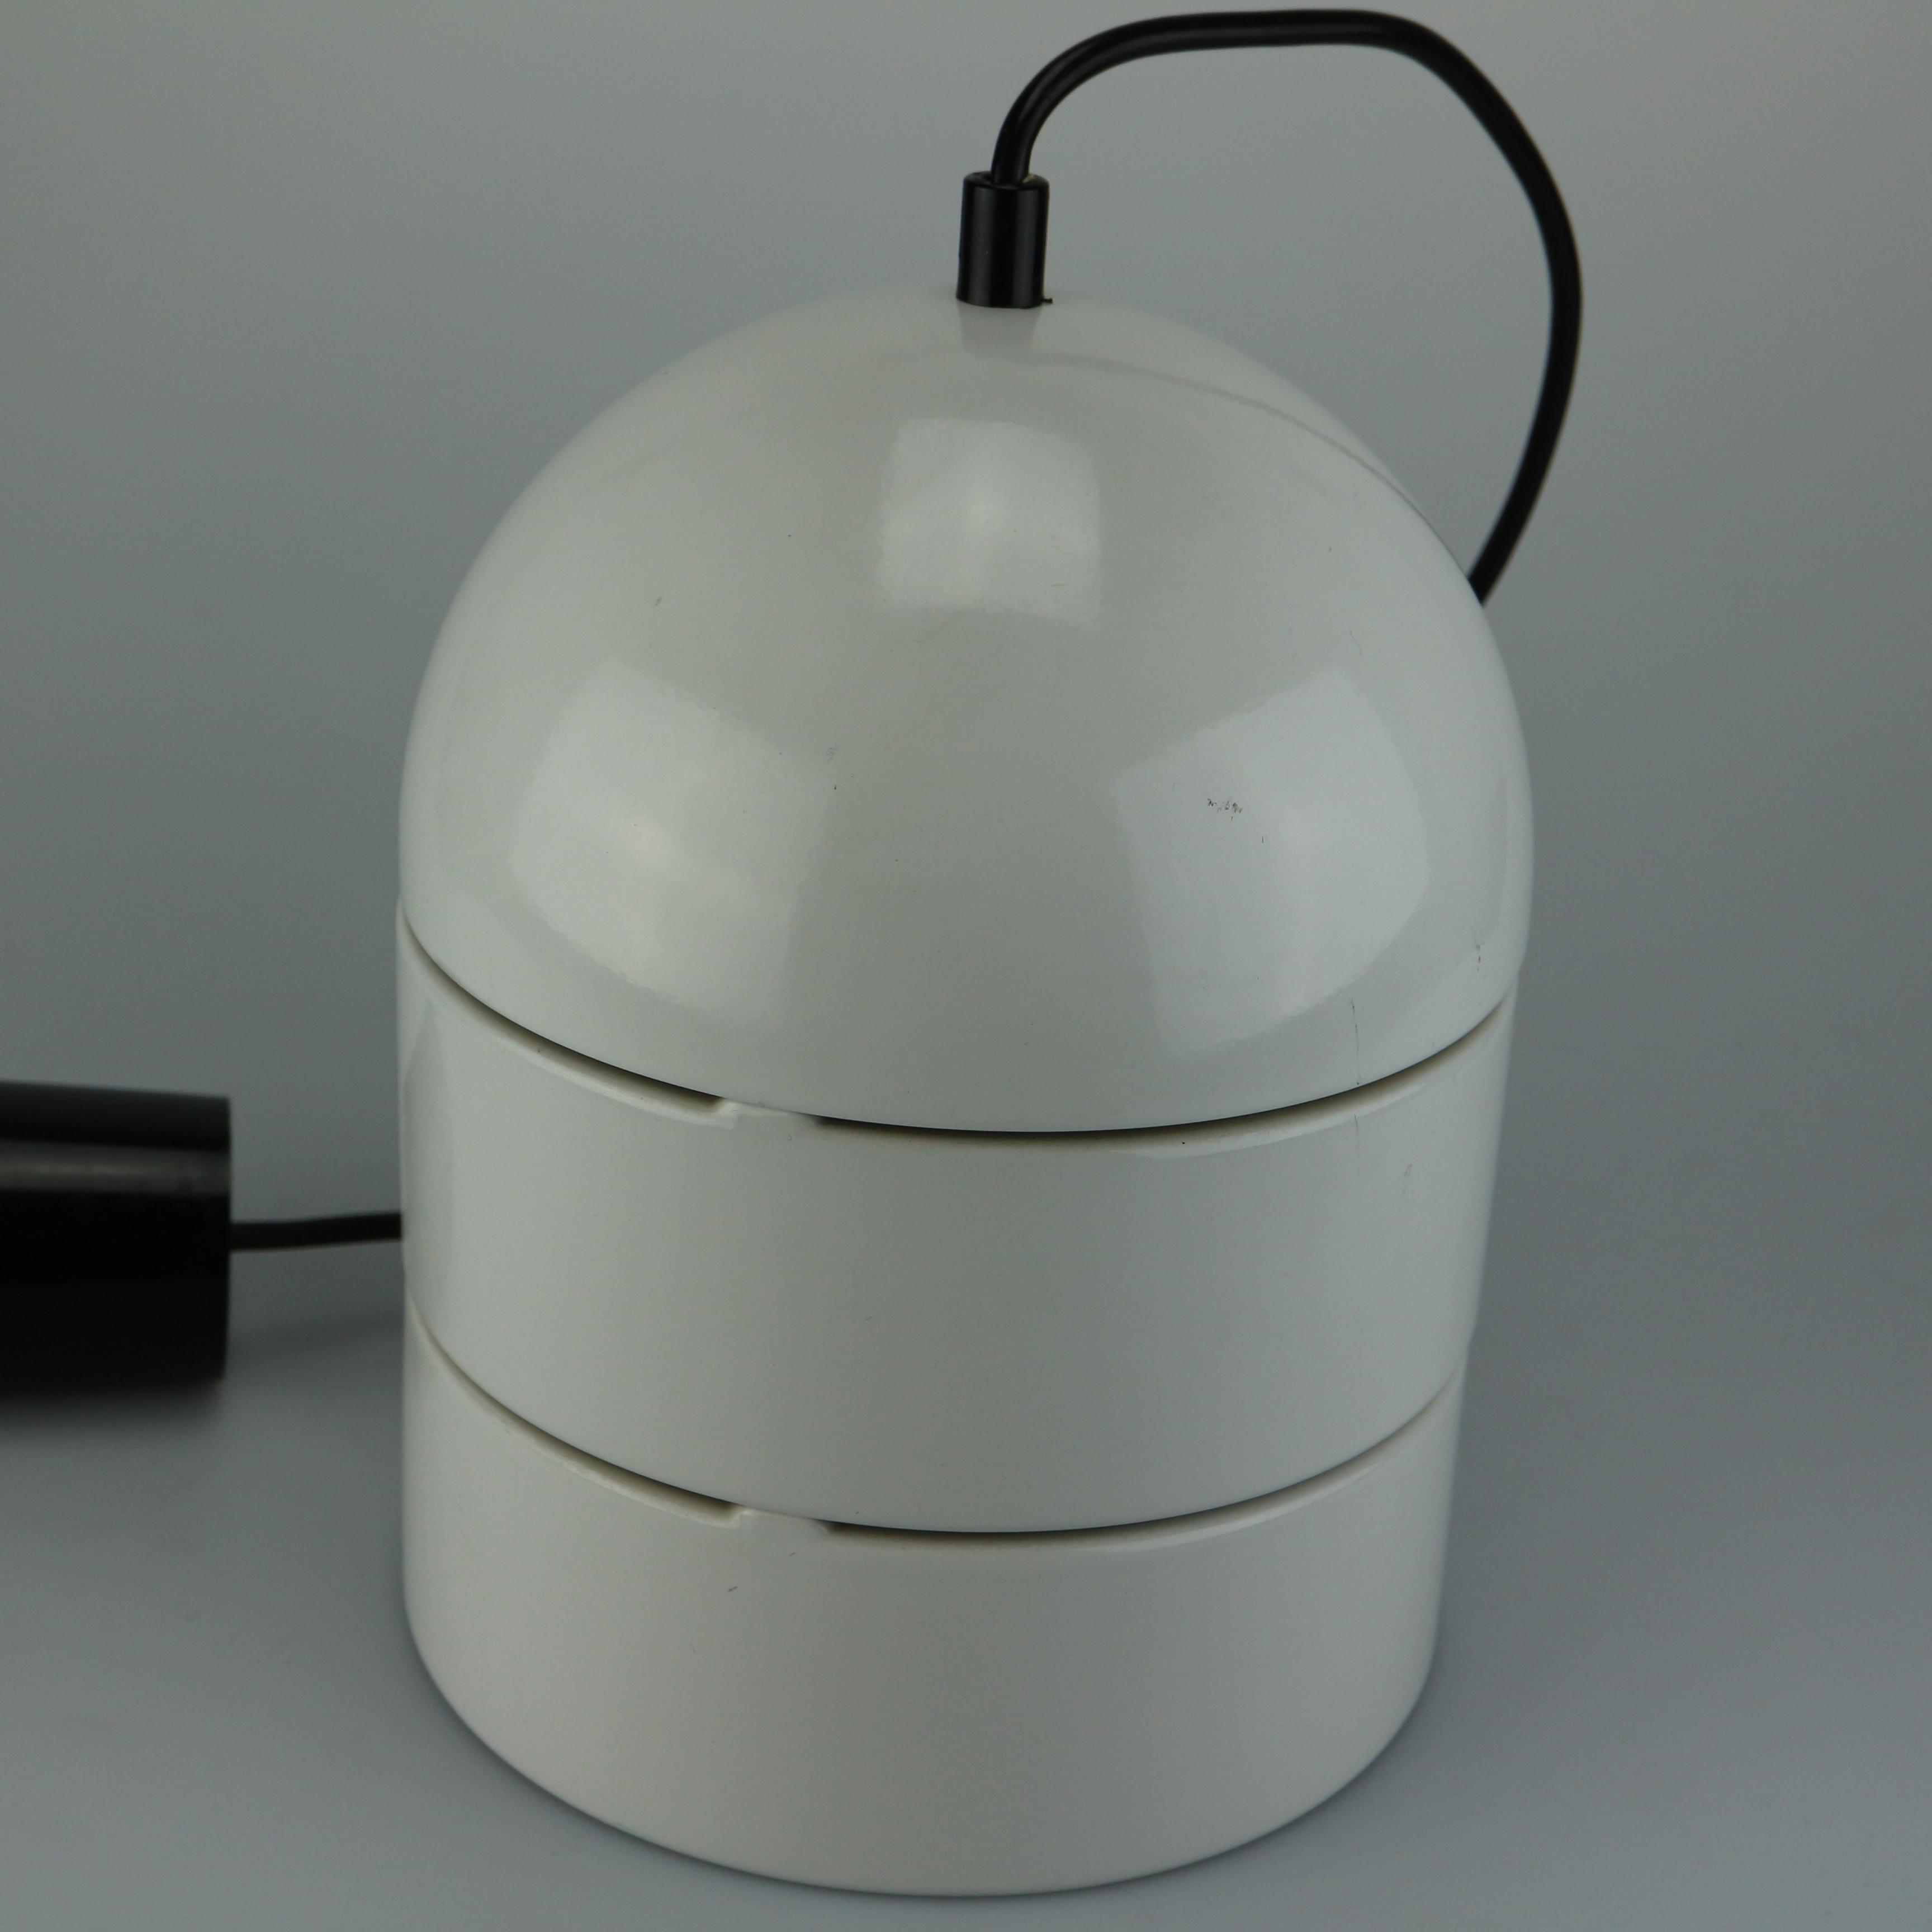 Vintage B Design Lampe Lighting Lamps Ceiling Lights Auctionet